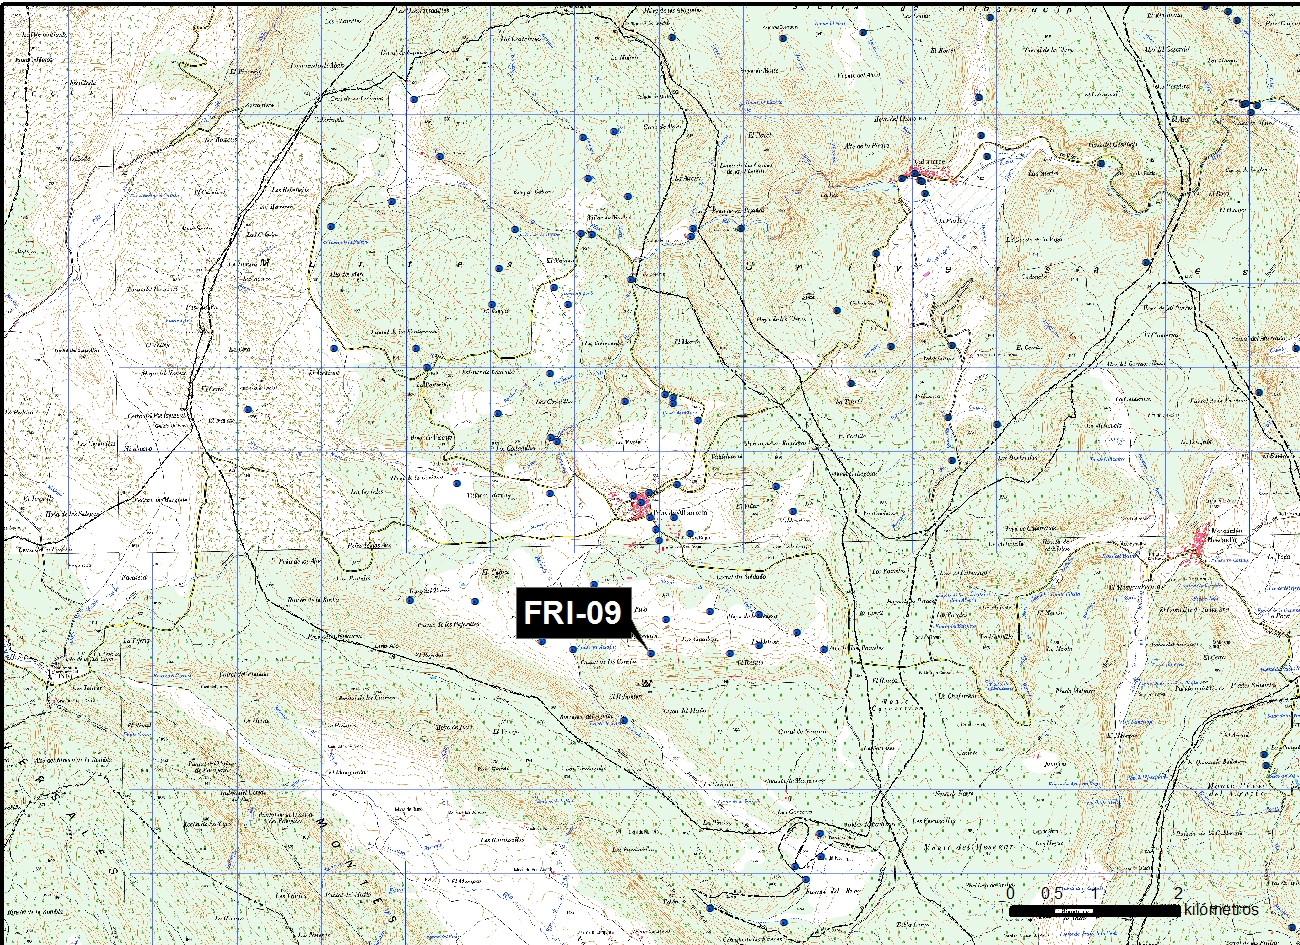 FRI_09_M.V.LOZANO_PINO_MAP.TOPO 1